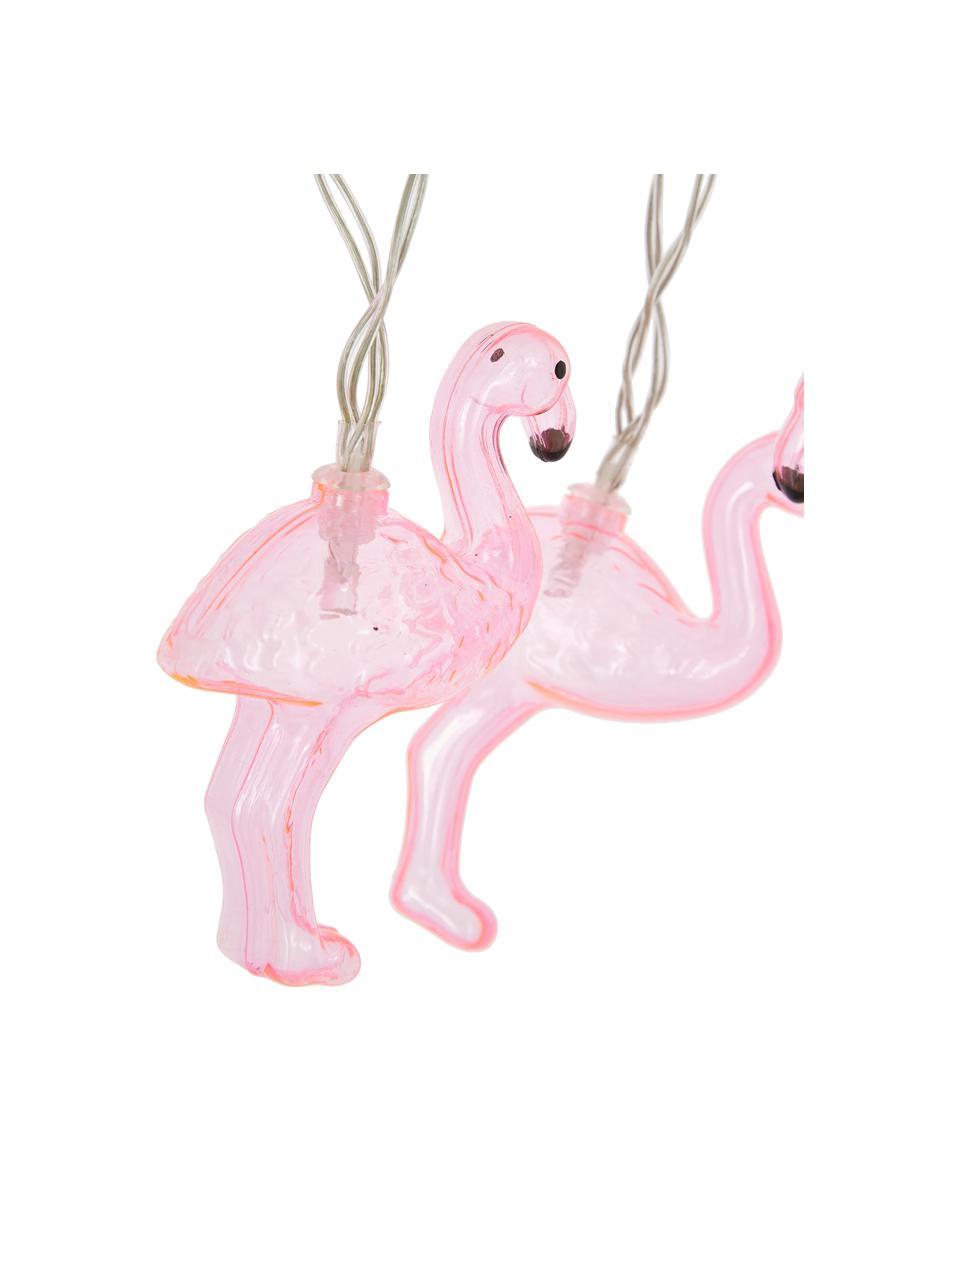 Ghirlanda  a LED Flamingo, 230 cm, 10 lampioni, Rosa, Lung. 230 cm